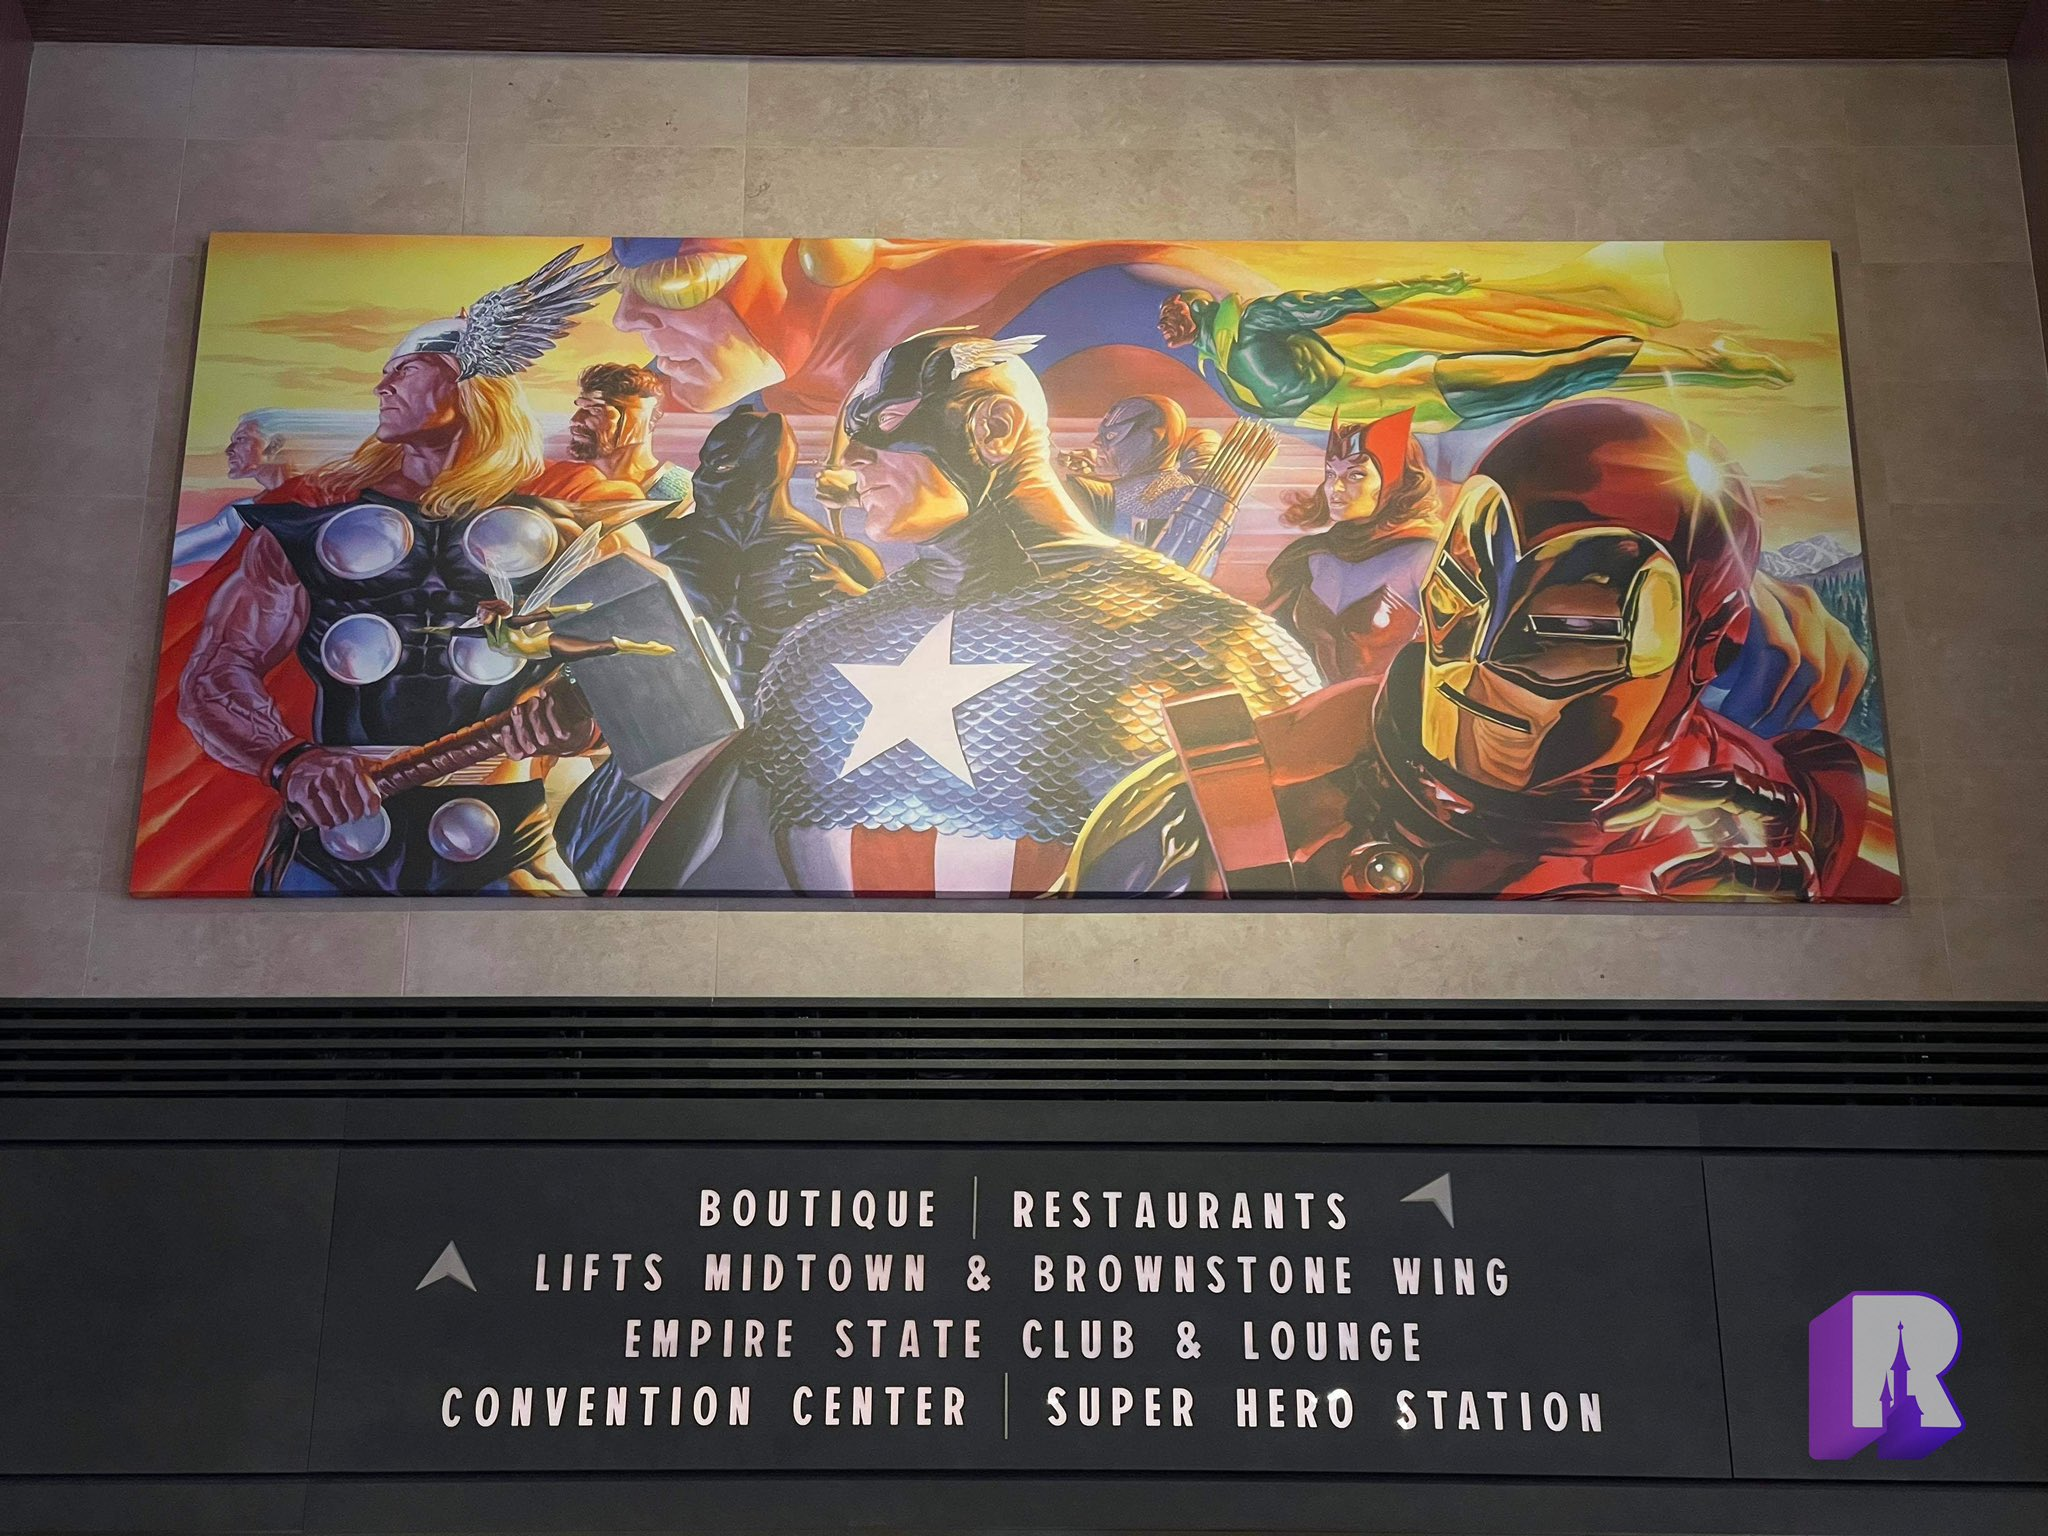 Disney's Hotel New York - The Art of Marvel - Pagina 3 E29wcn12